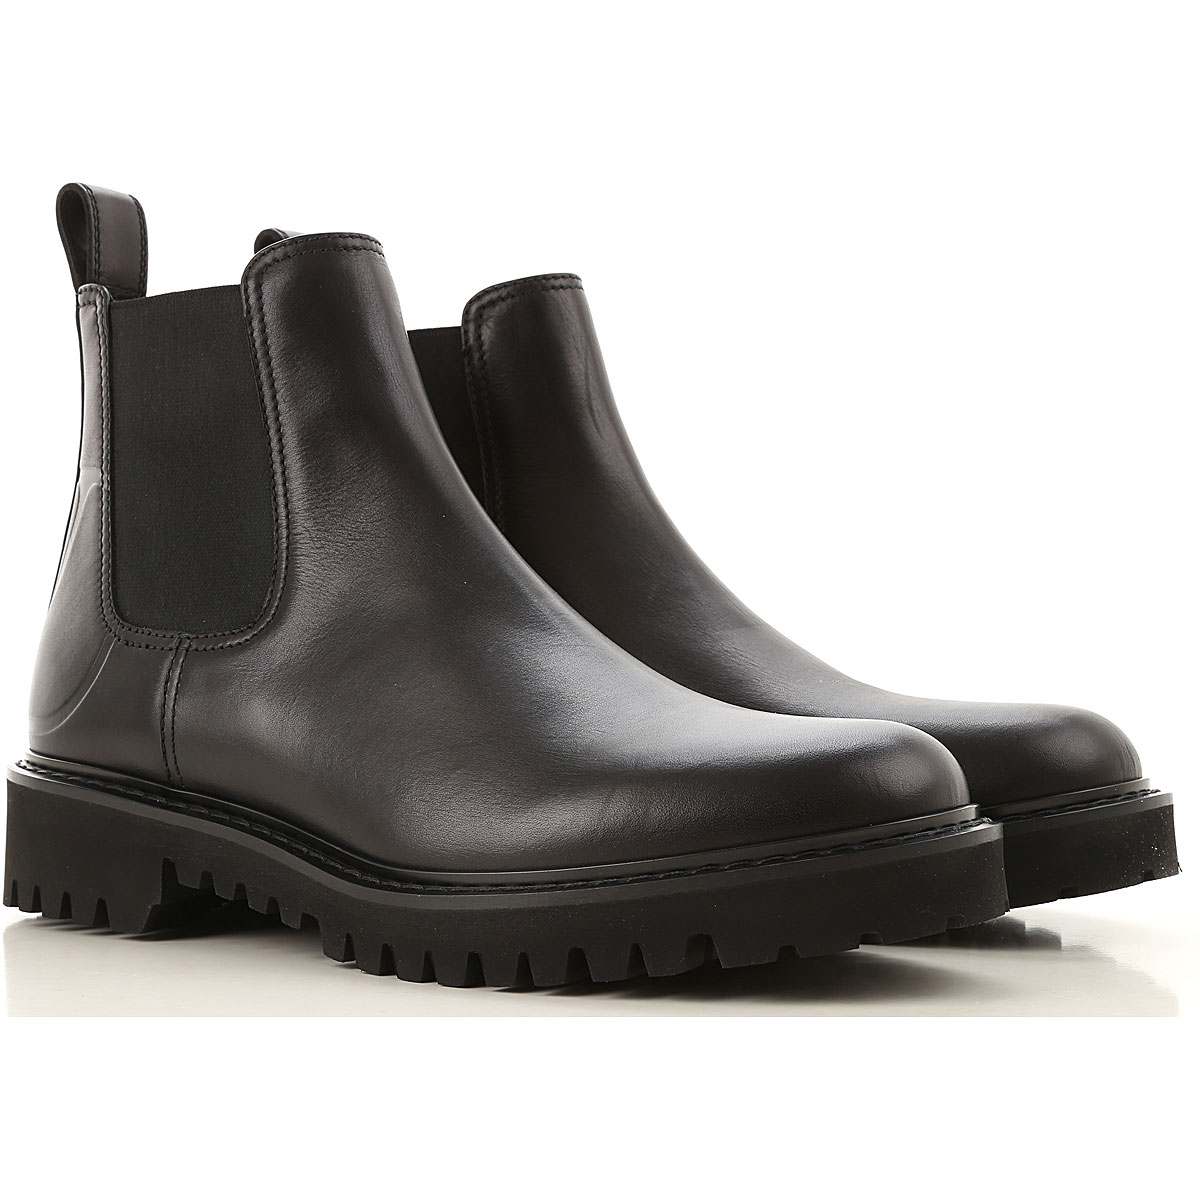 Valentino Garavani Chelsea Boots for Men On Sale, Black, Leather, 2019, 10.5 11.5 7.5 9